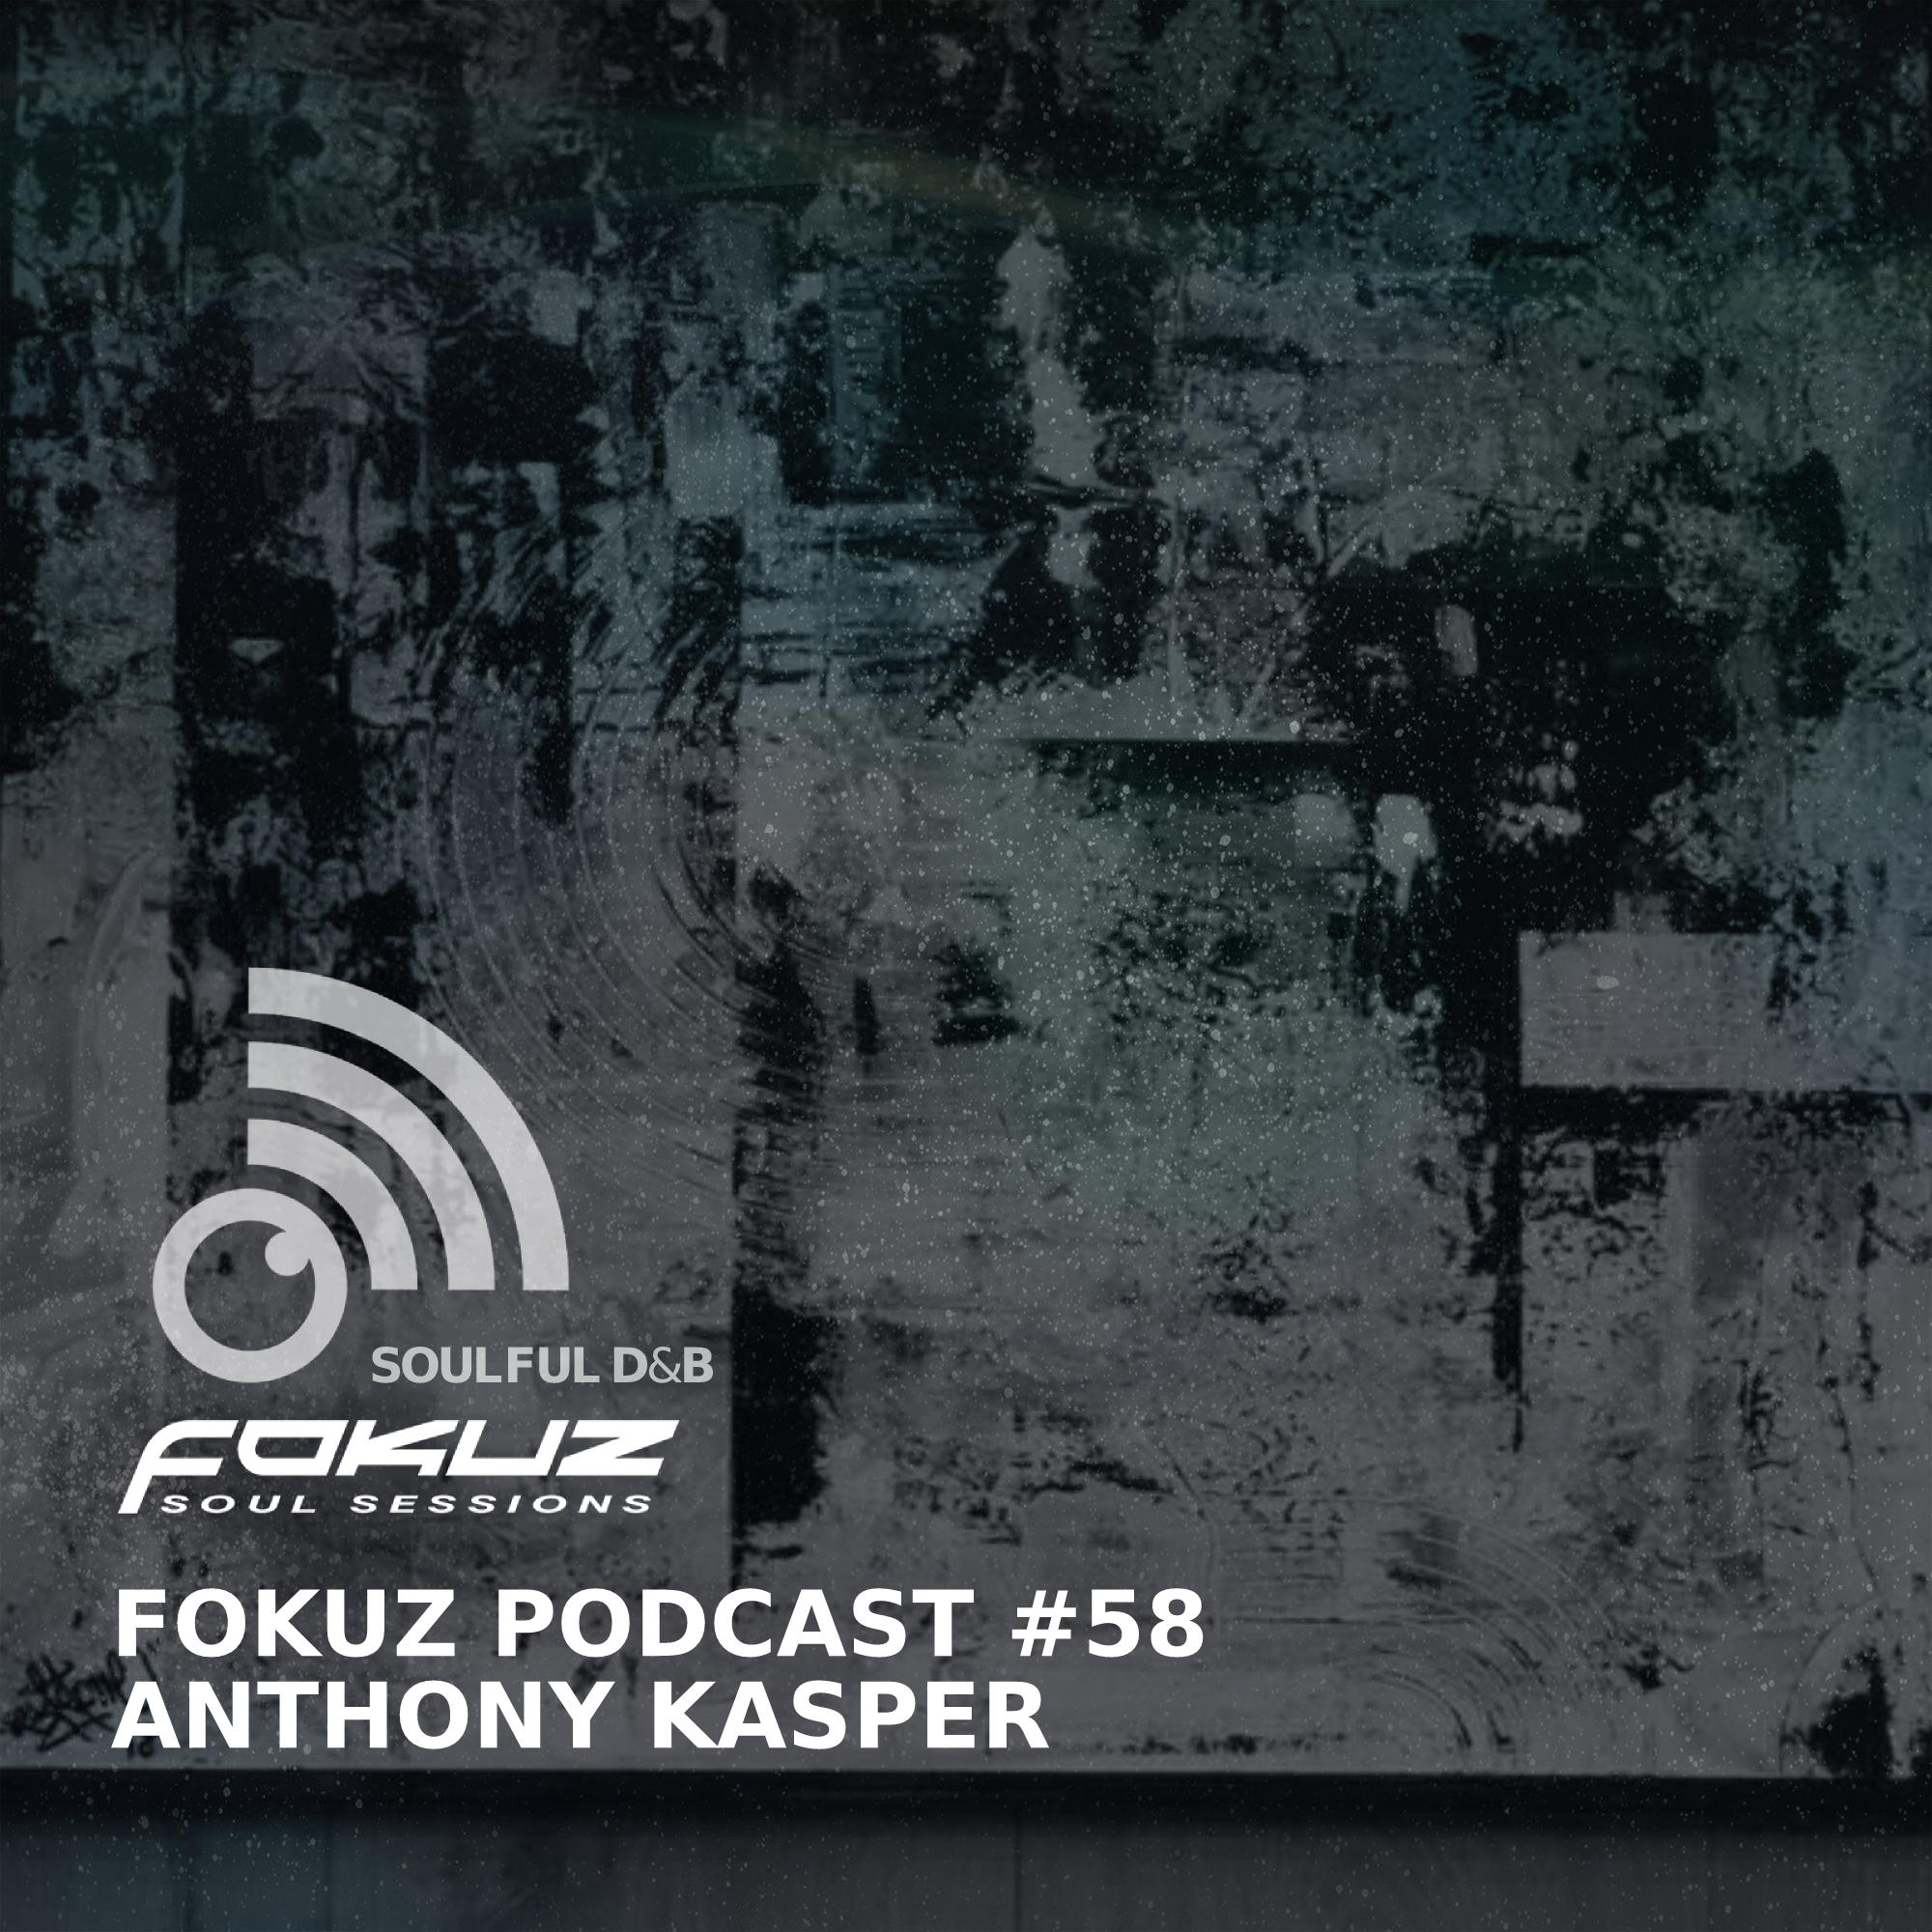 Fokuz Podcast 58 art.jpg